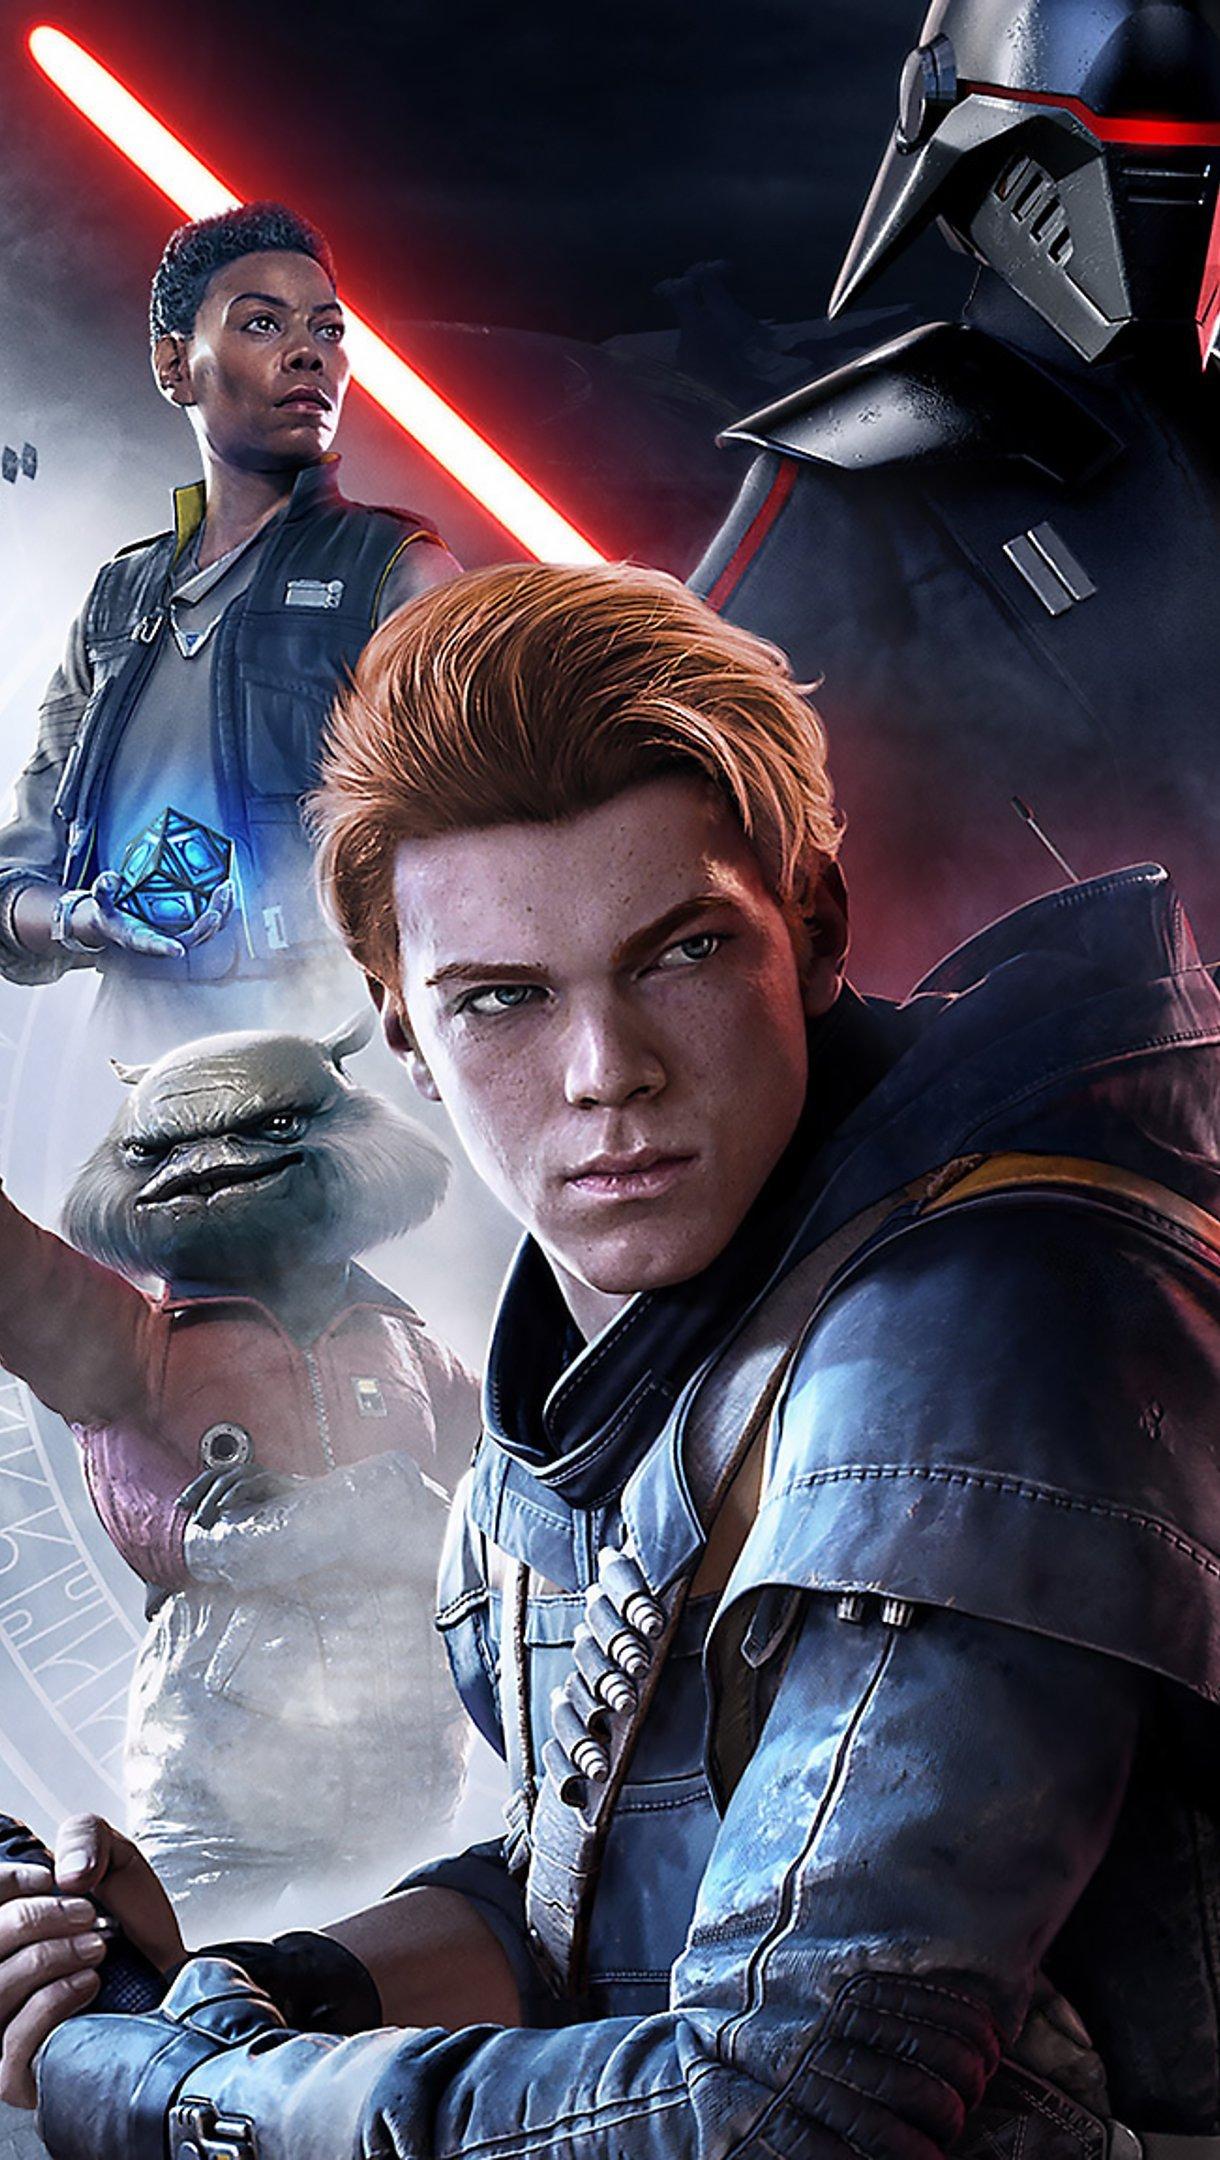 Star Wars Jedi Fallen Order Game Wallpaper 4k Ultra HD ID:3638